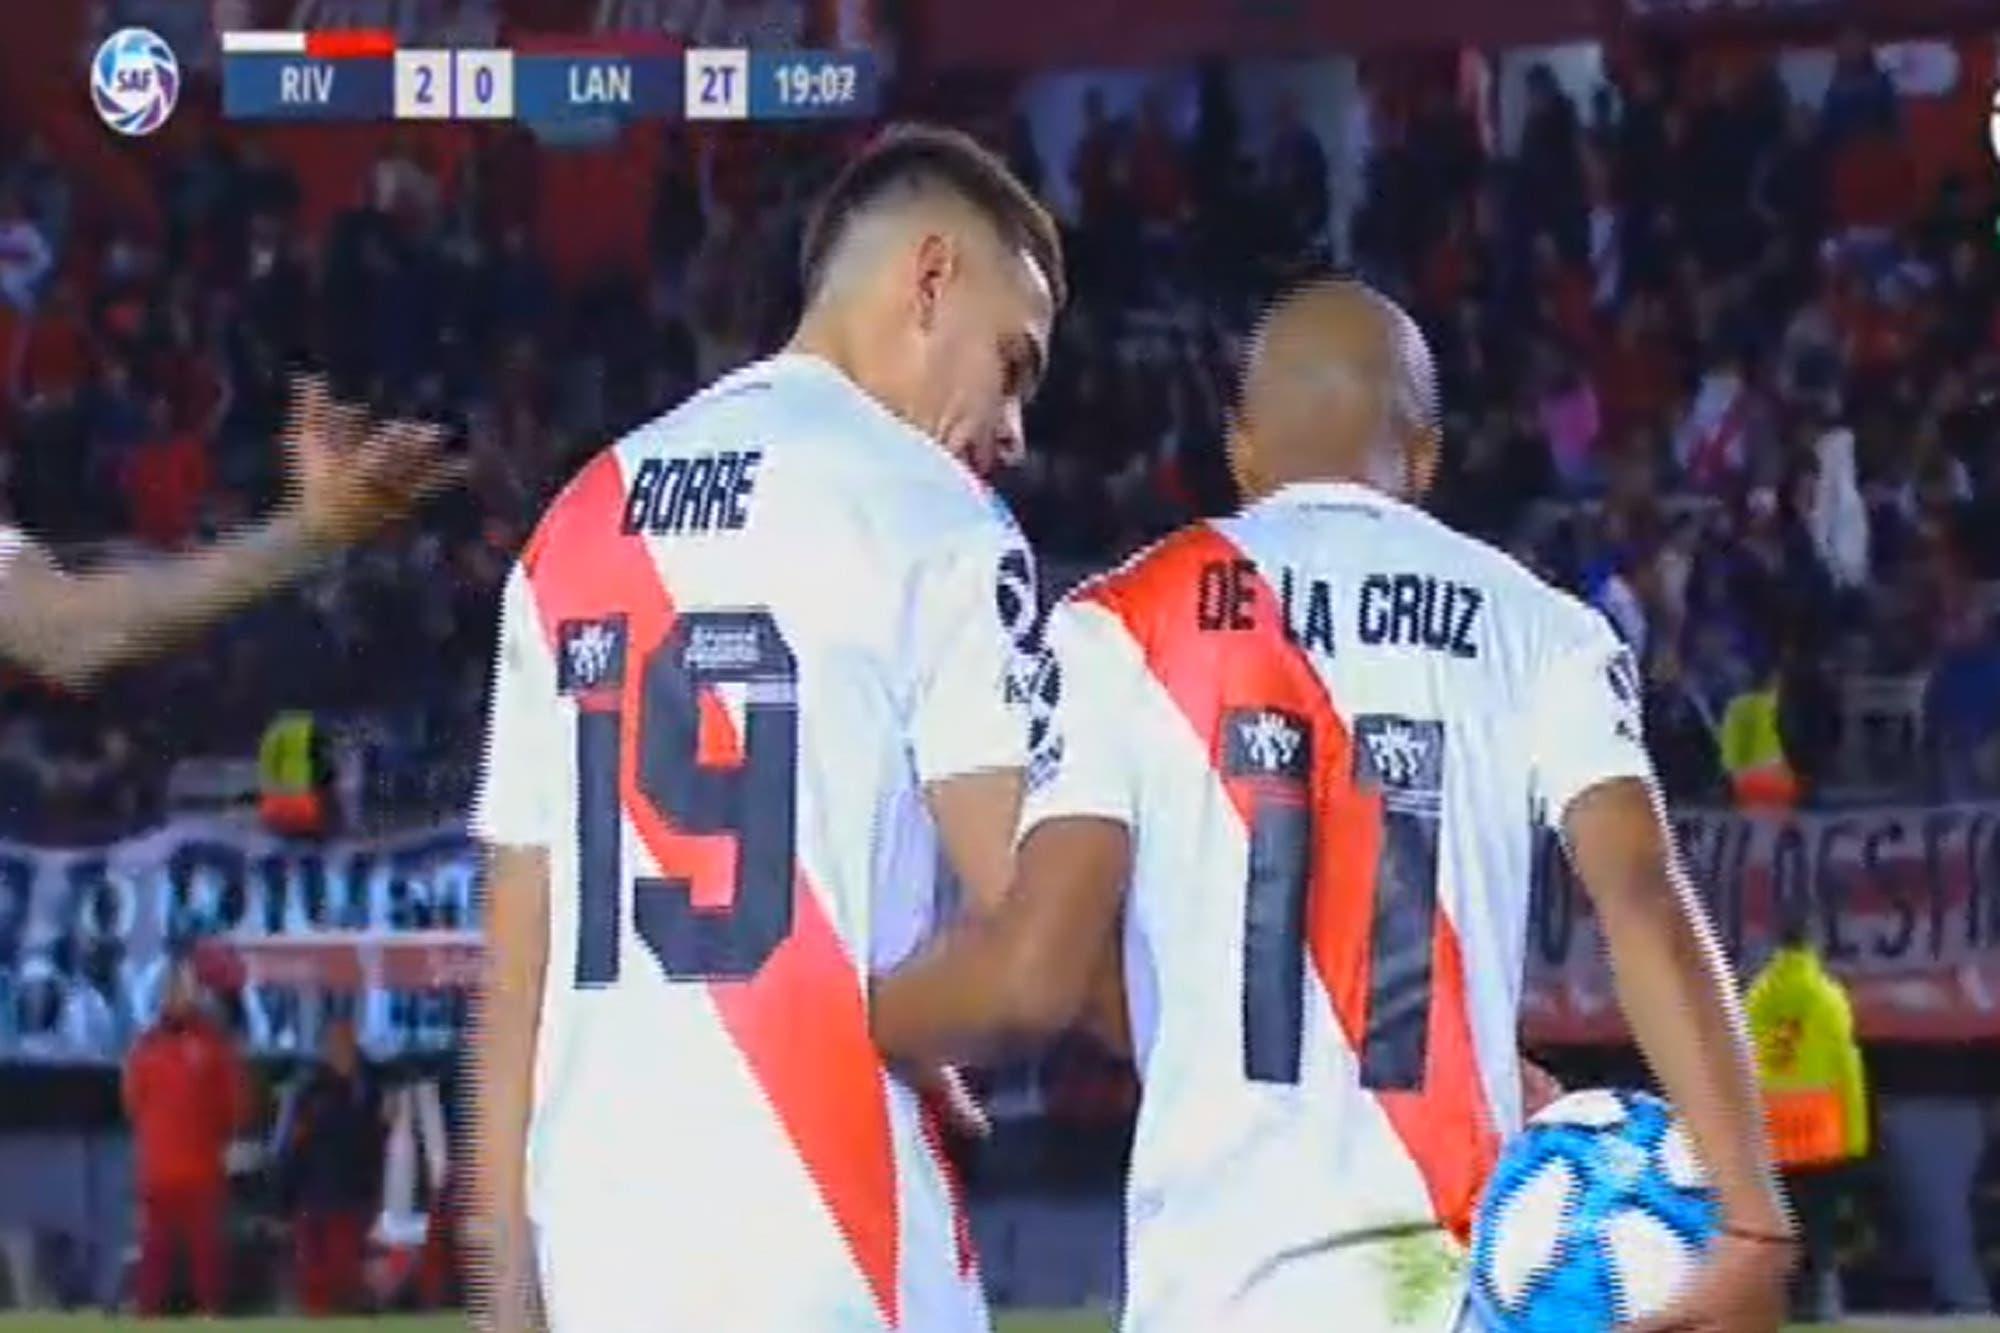 River-Lanús, Superliga: De la Cruz le sacó un penal a Borré, tiró un lujo y terminó mal